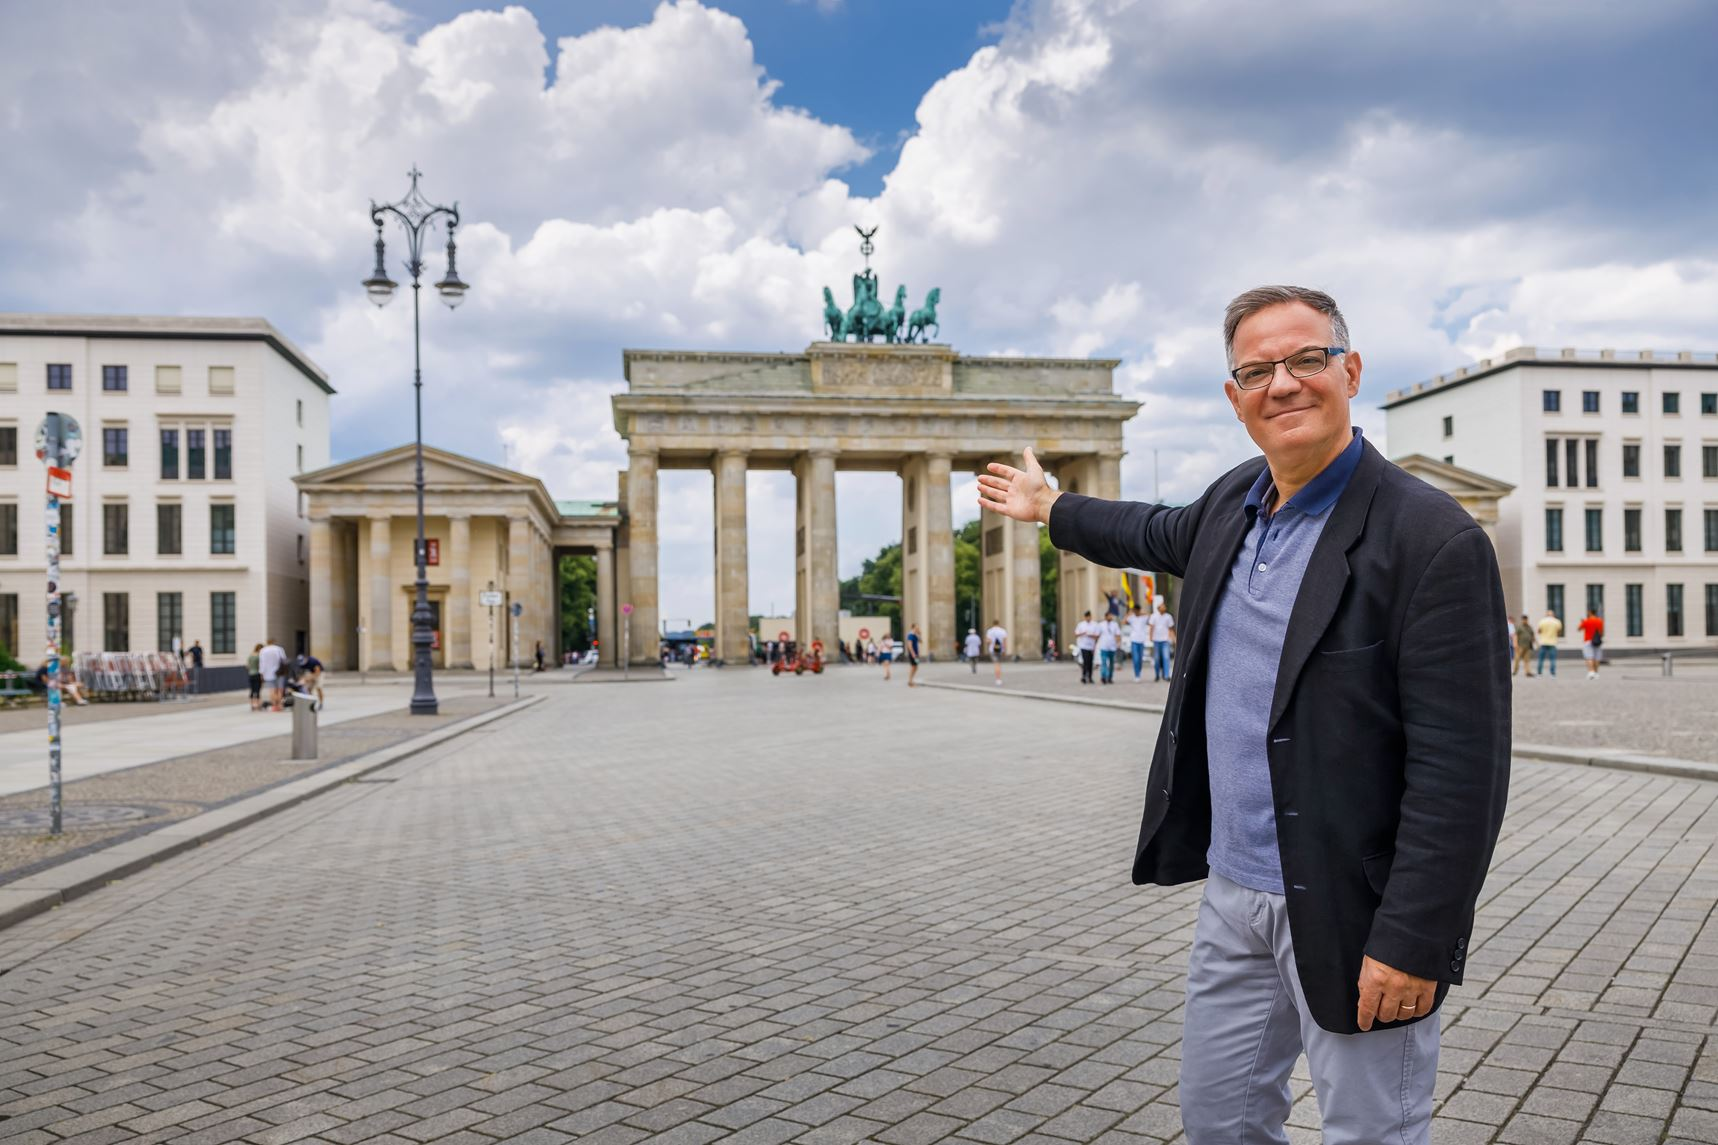 Stadtrundfahrt Berlin: Stadtführung Berlin vor dem Brandenburger Tor